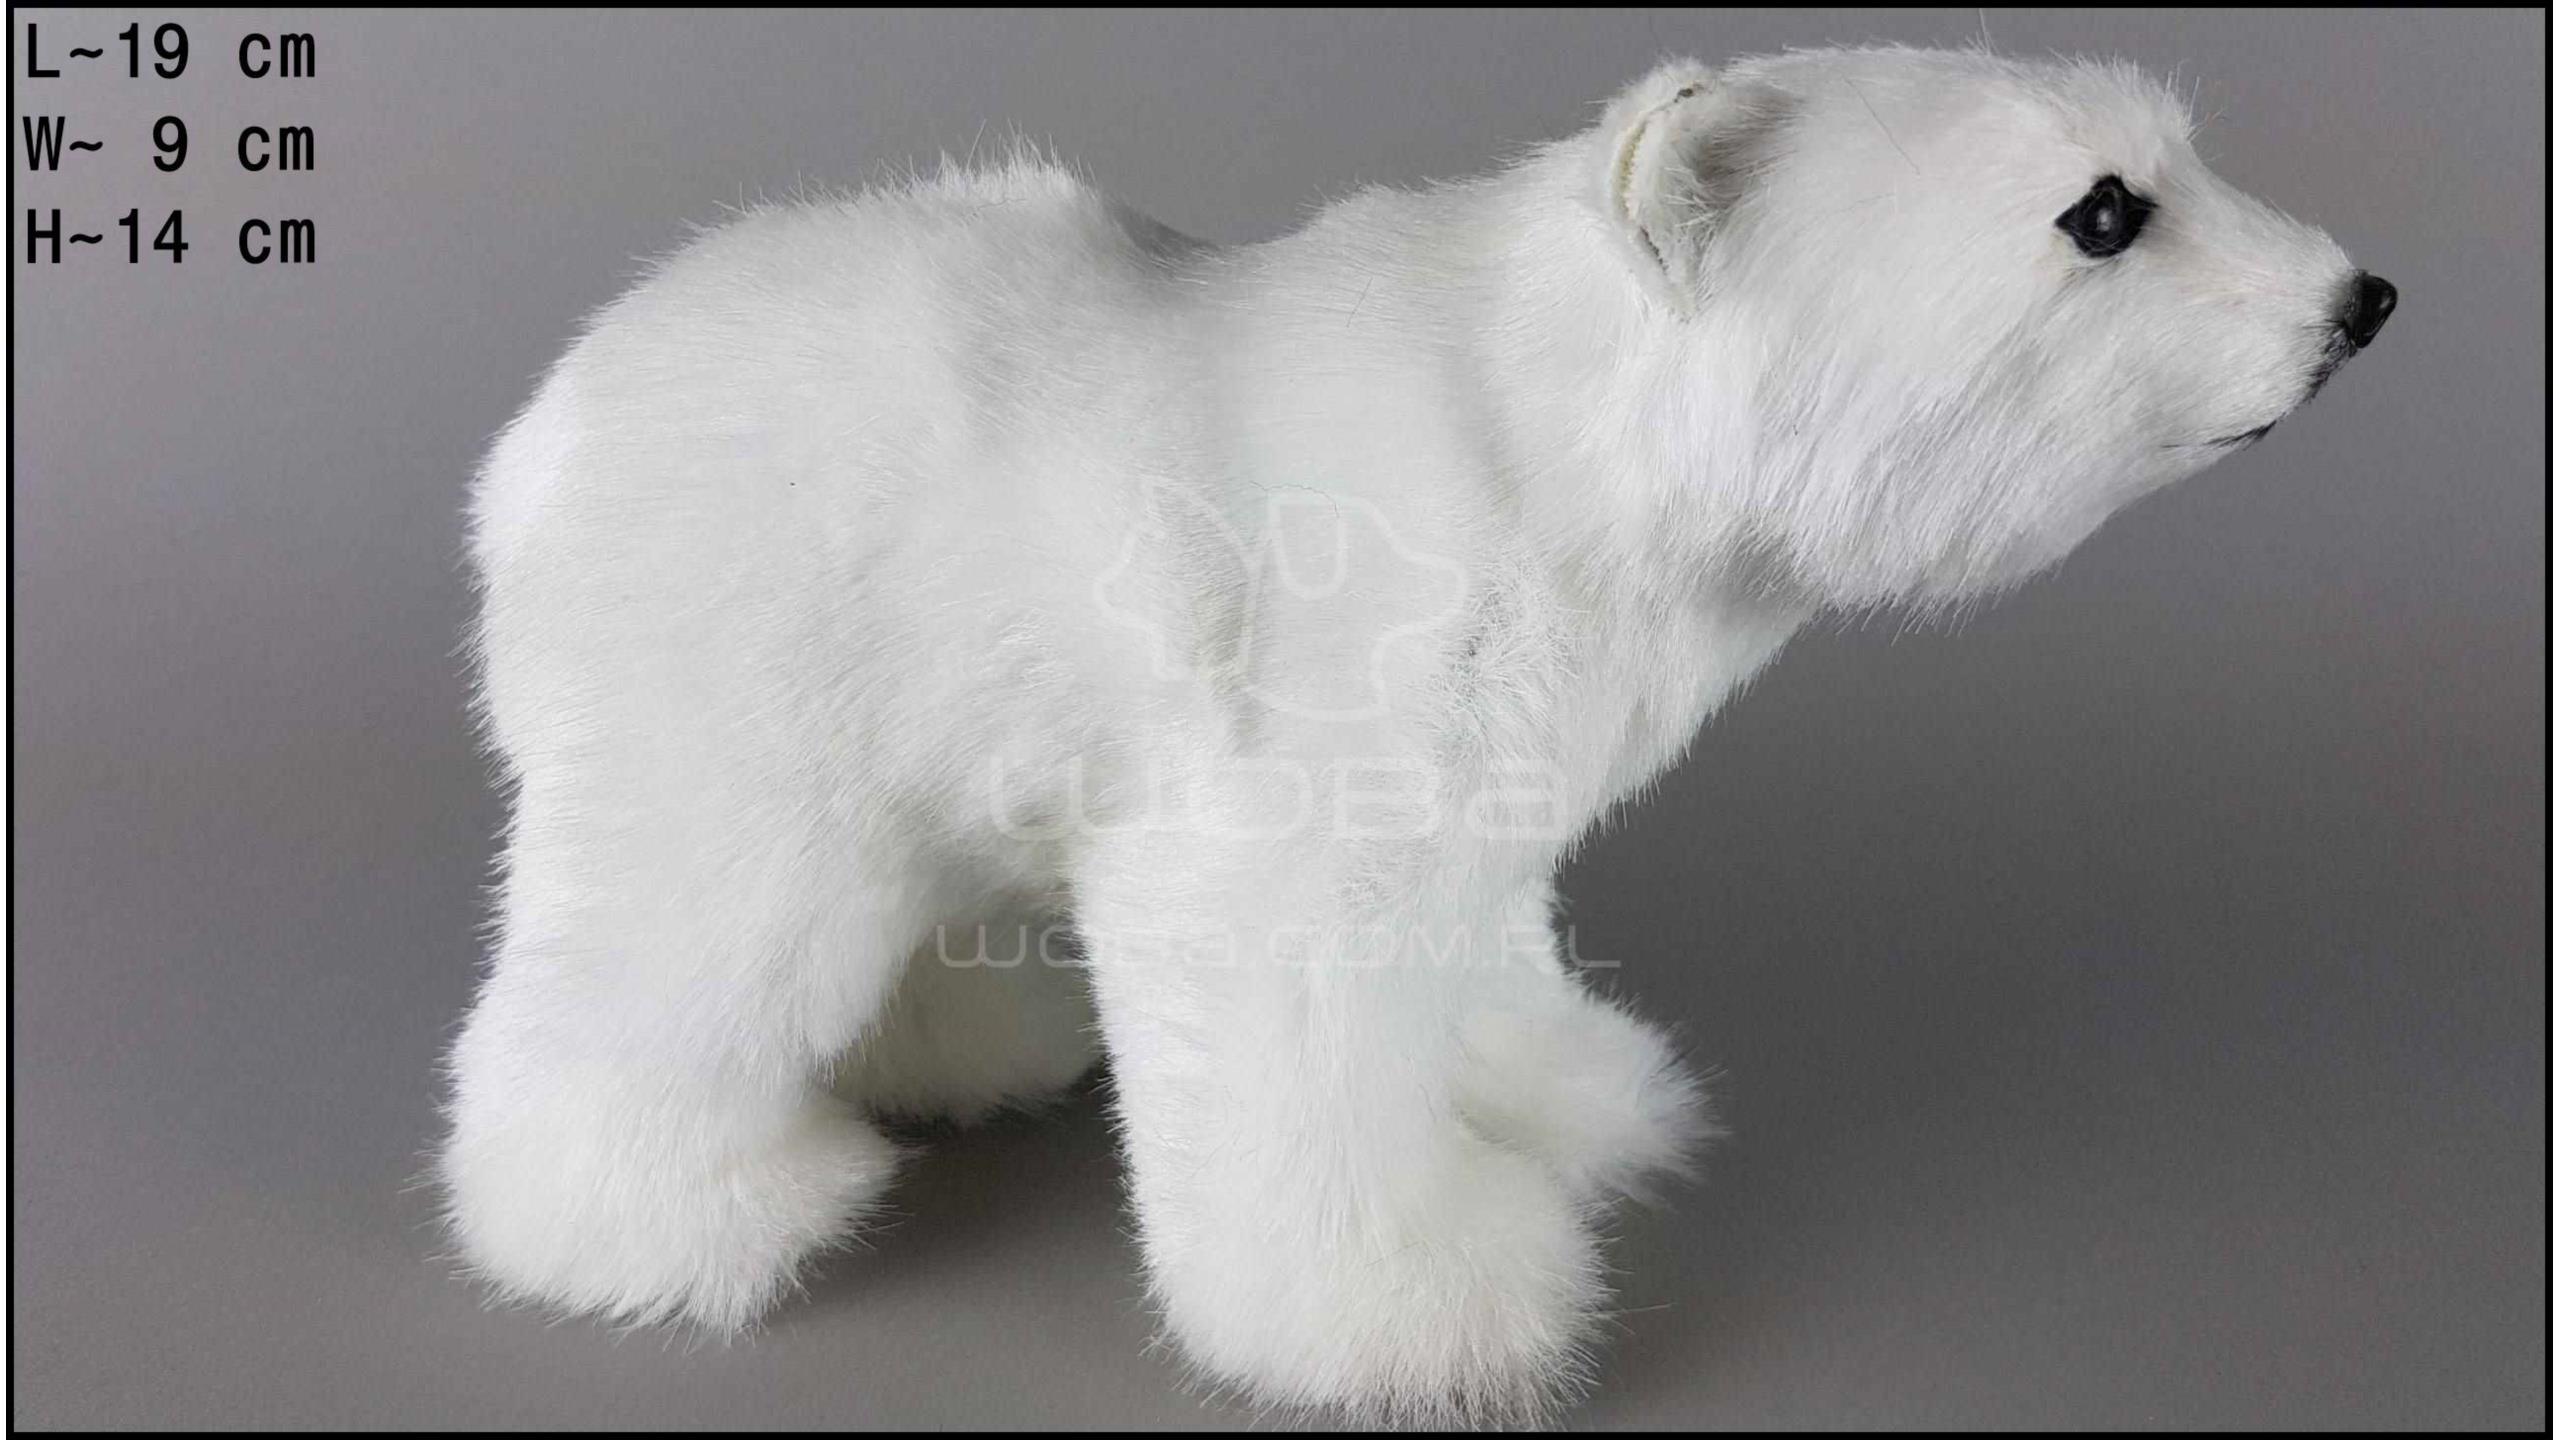 Polar bear - Standing